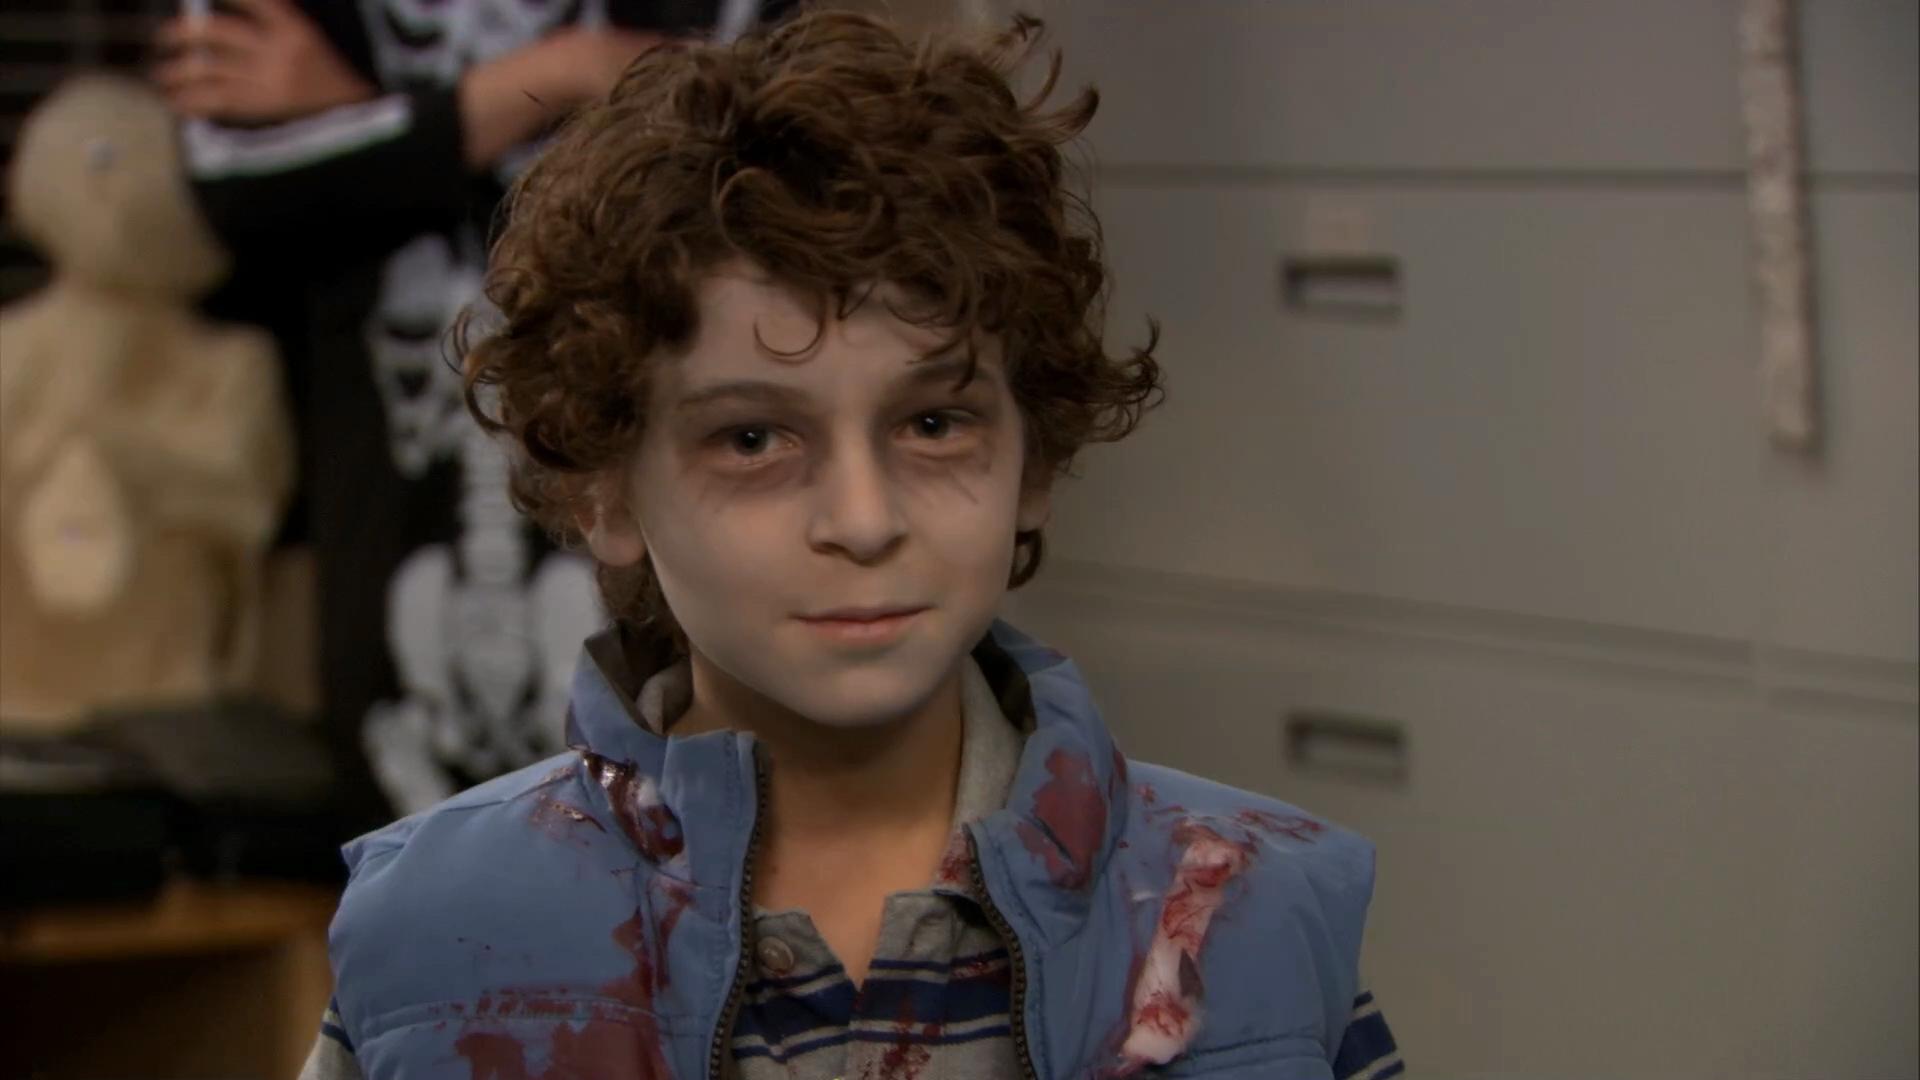 David Mazouz childhood photo one at Acrossair.com